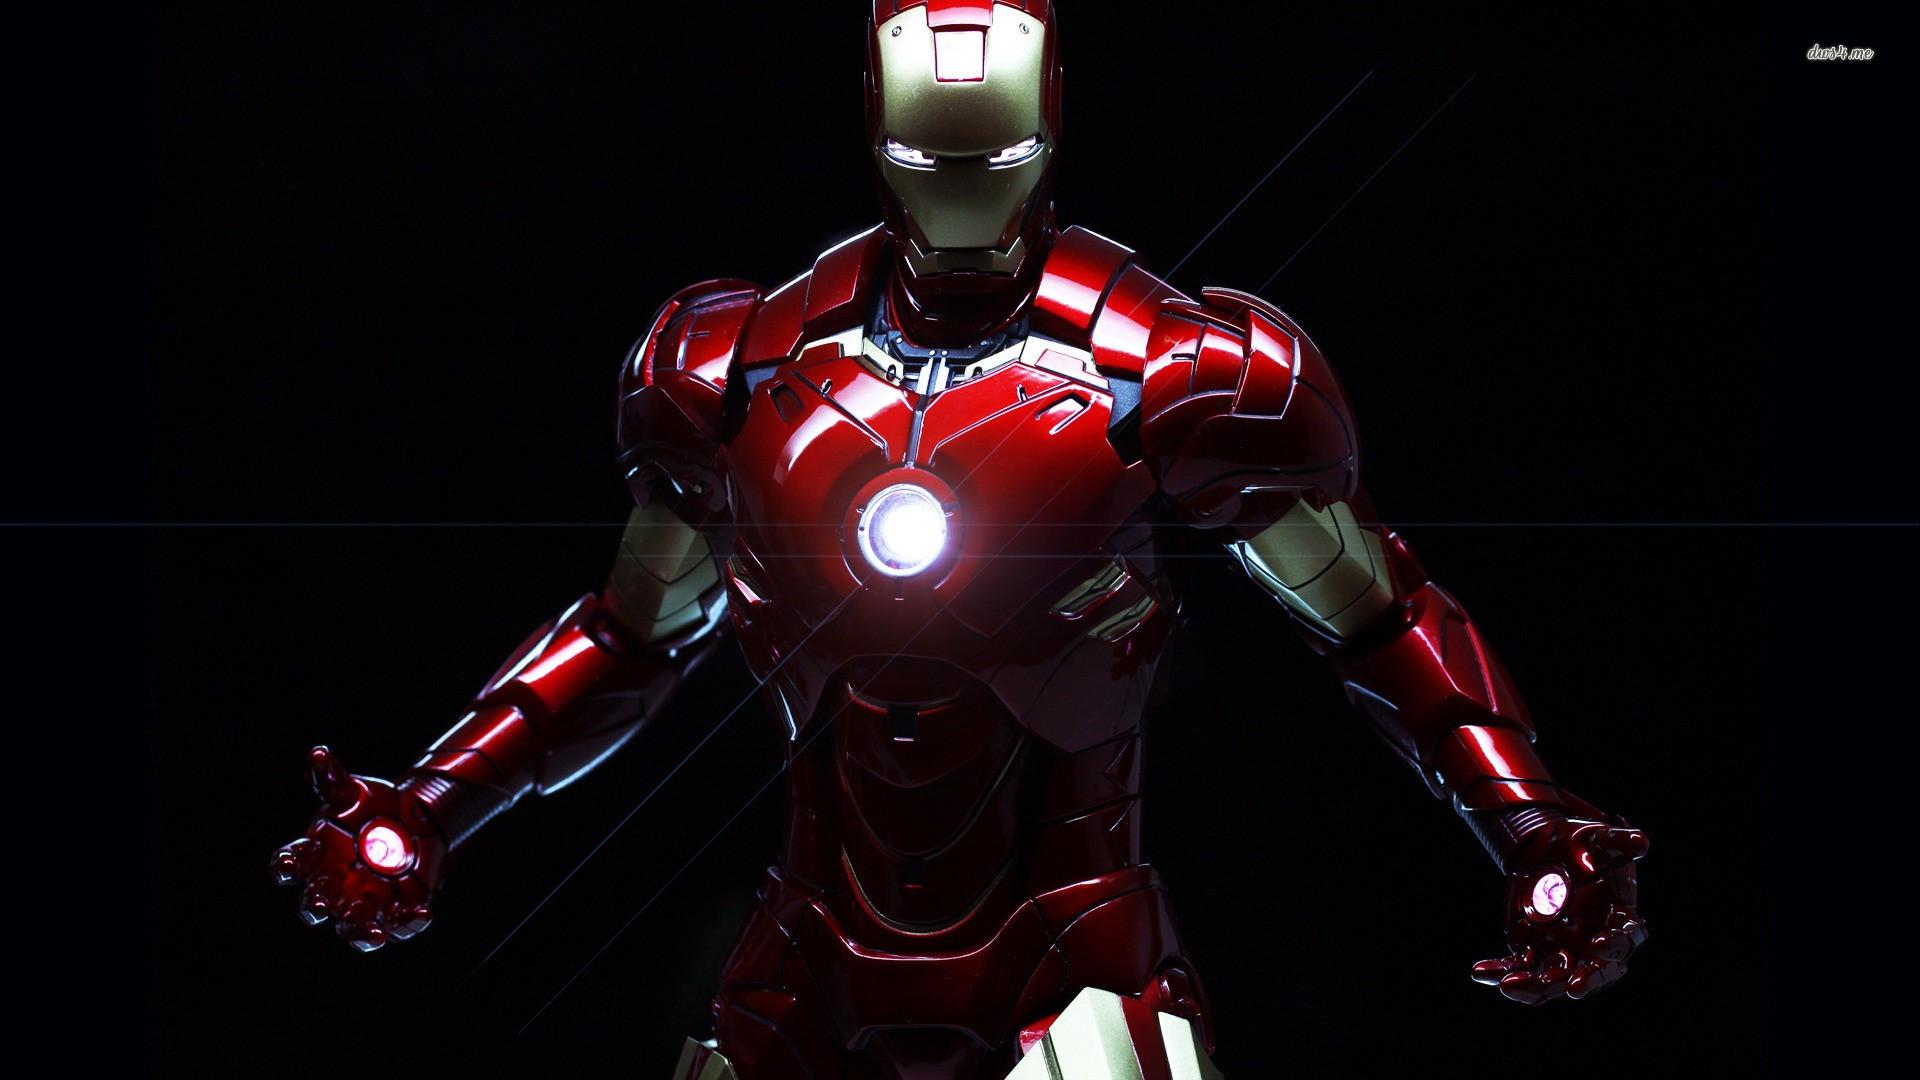 0 Iron Man Avengers Wallpaper Iron Man Avengers Wallpapers Group